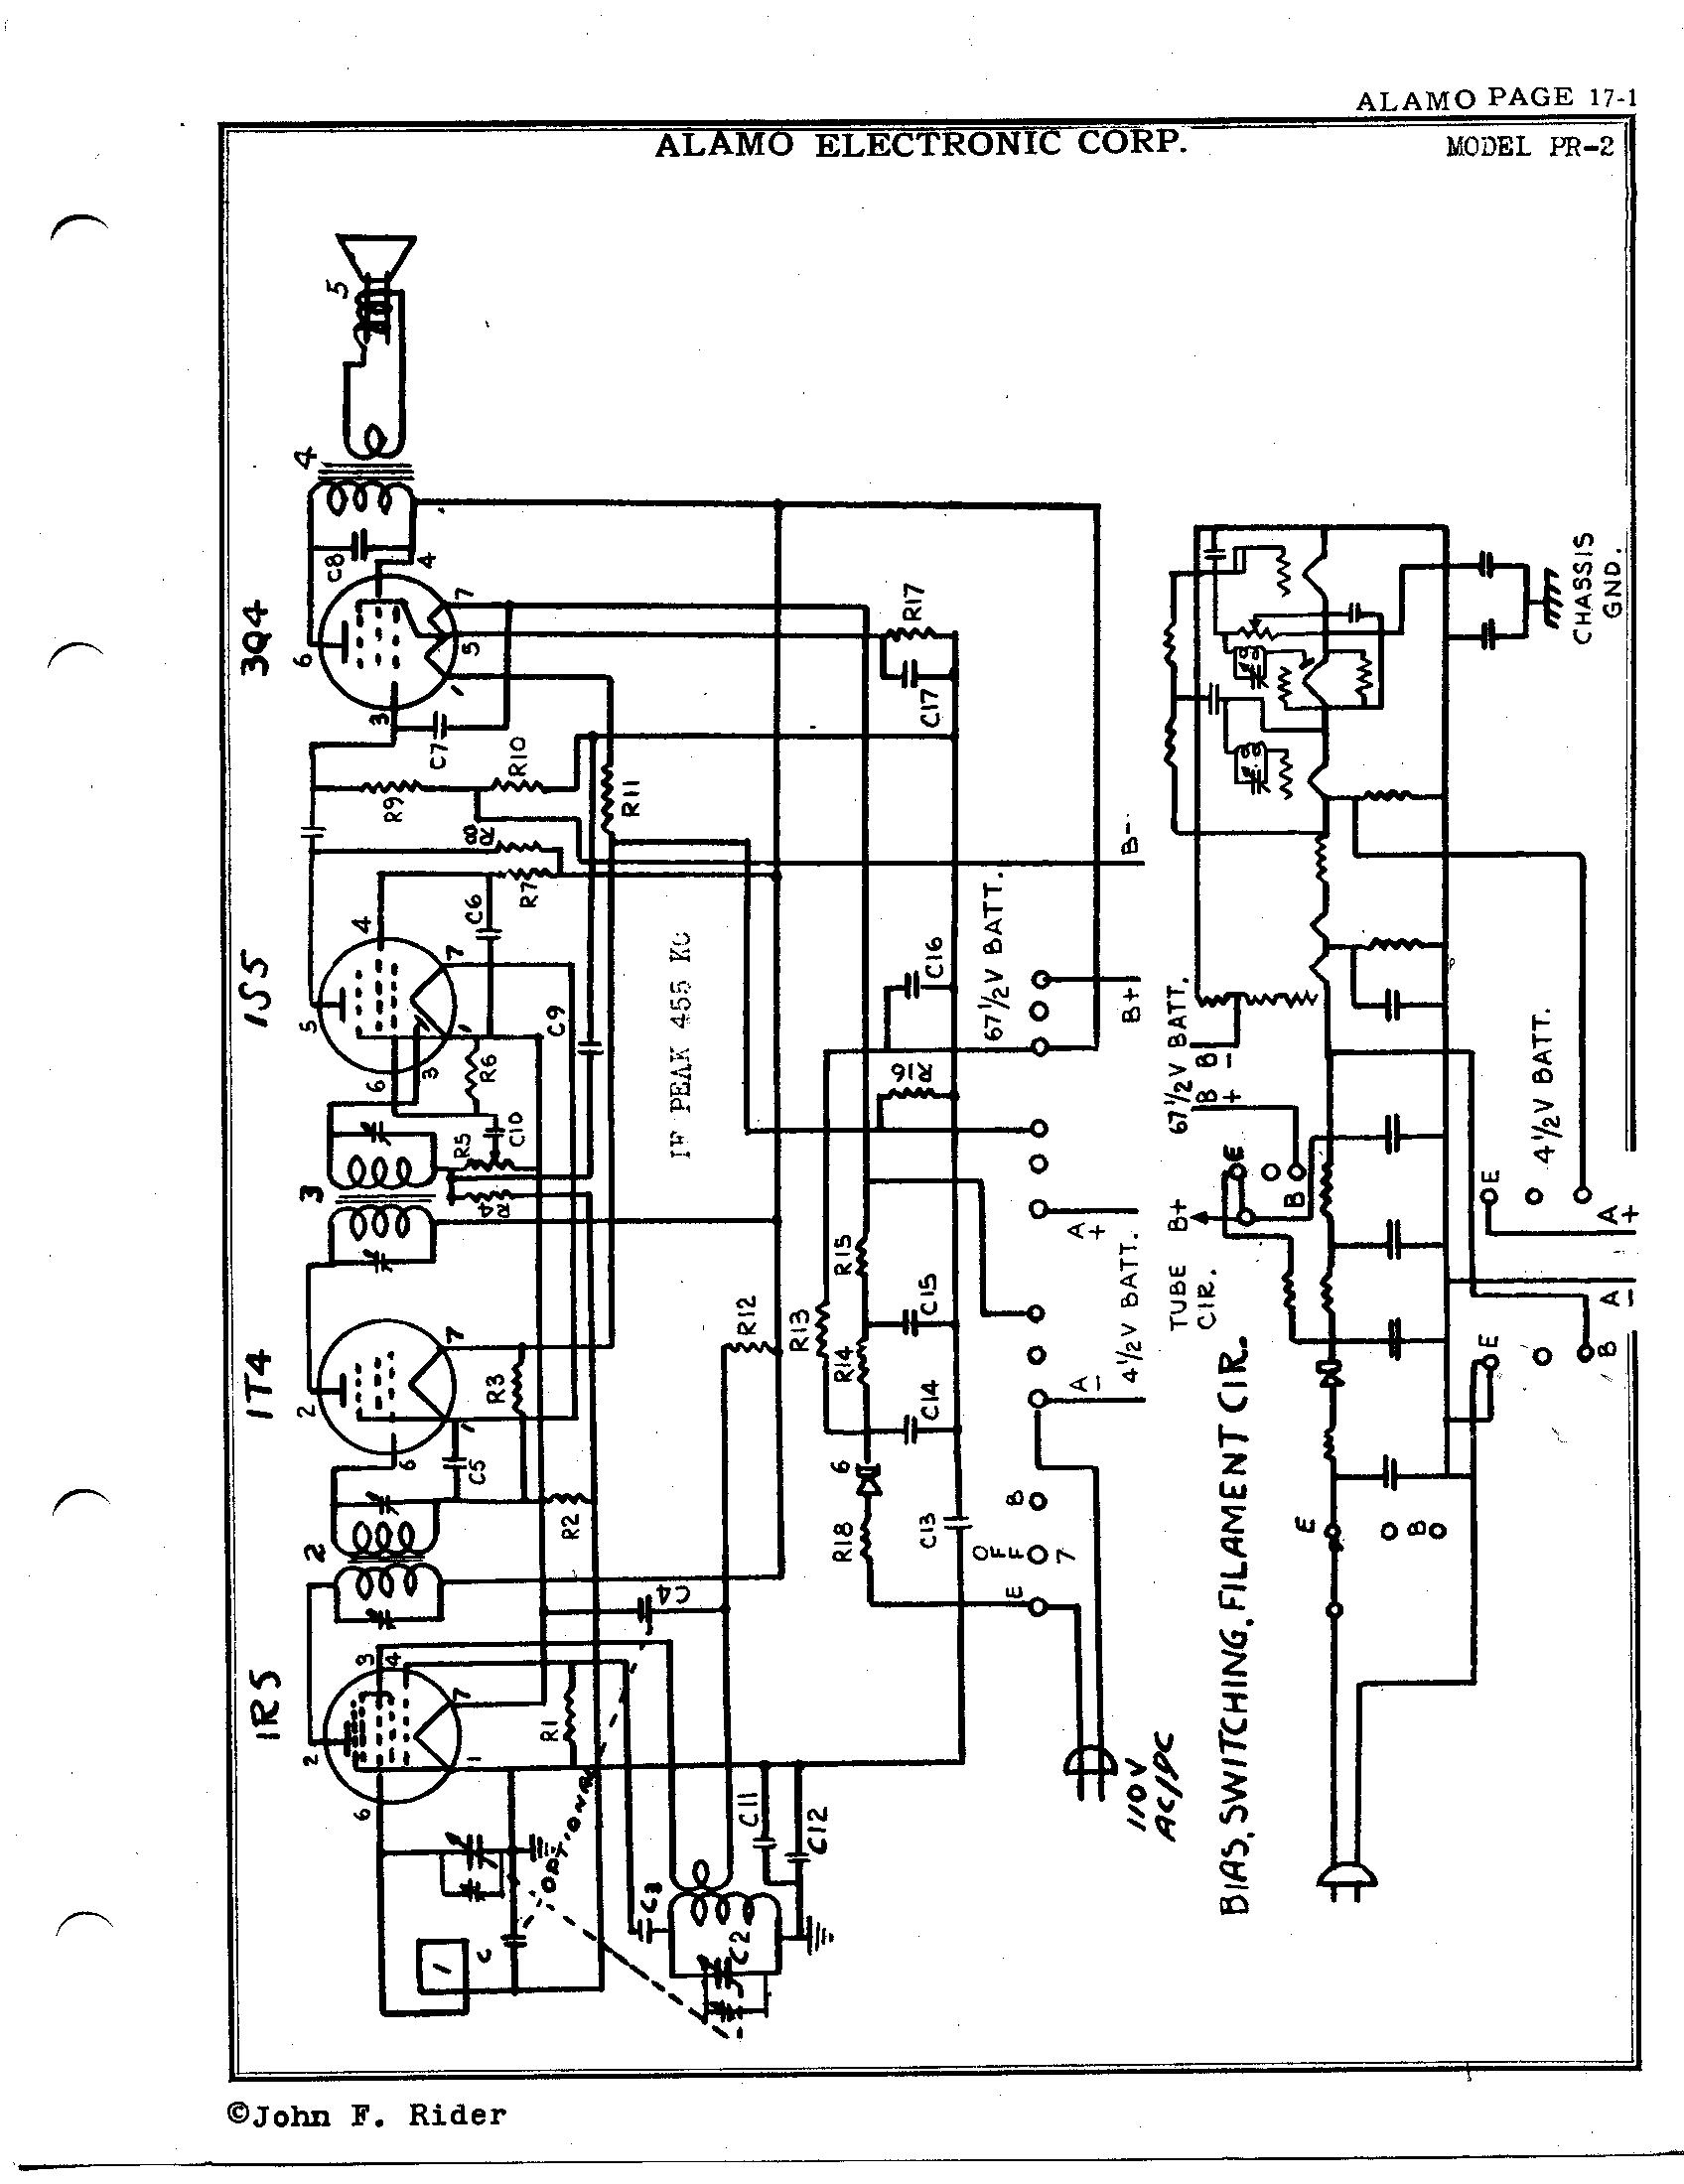 hight resolution of alamo amp schematics wiring diagram home alamo amp schematics